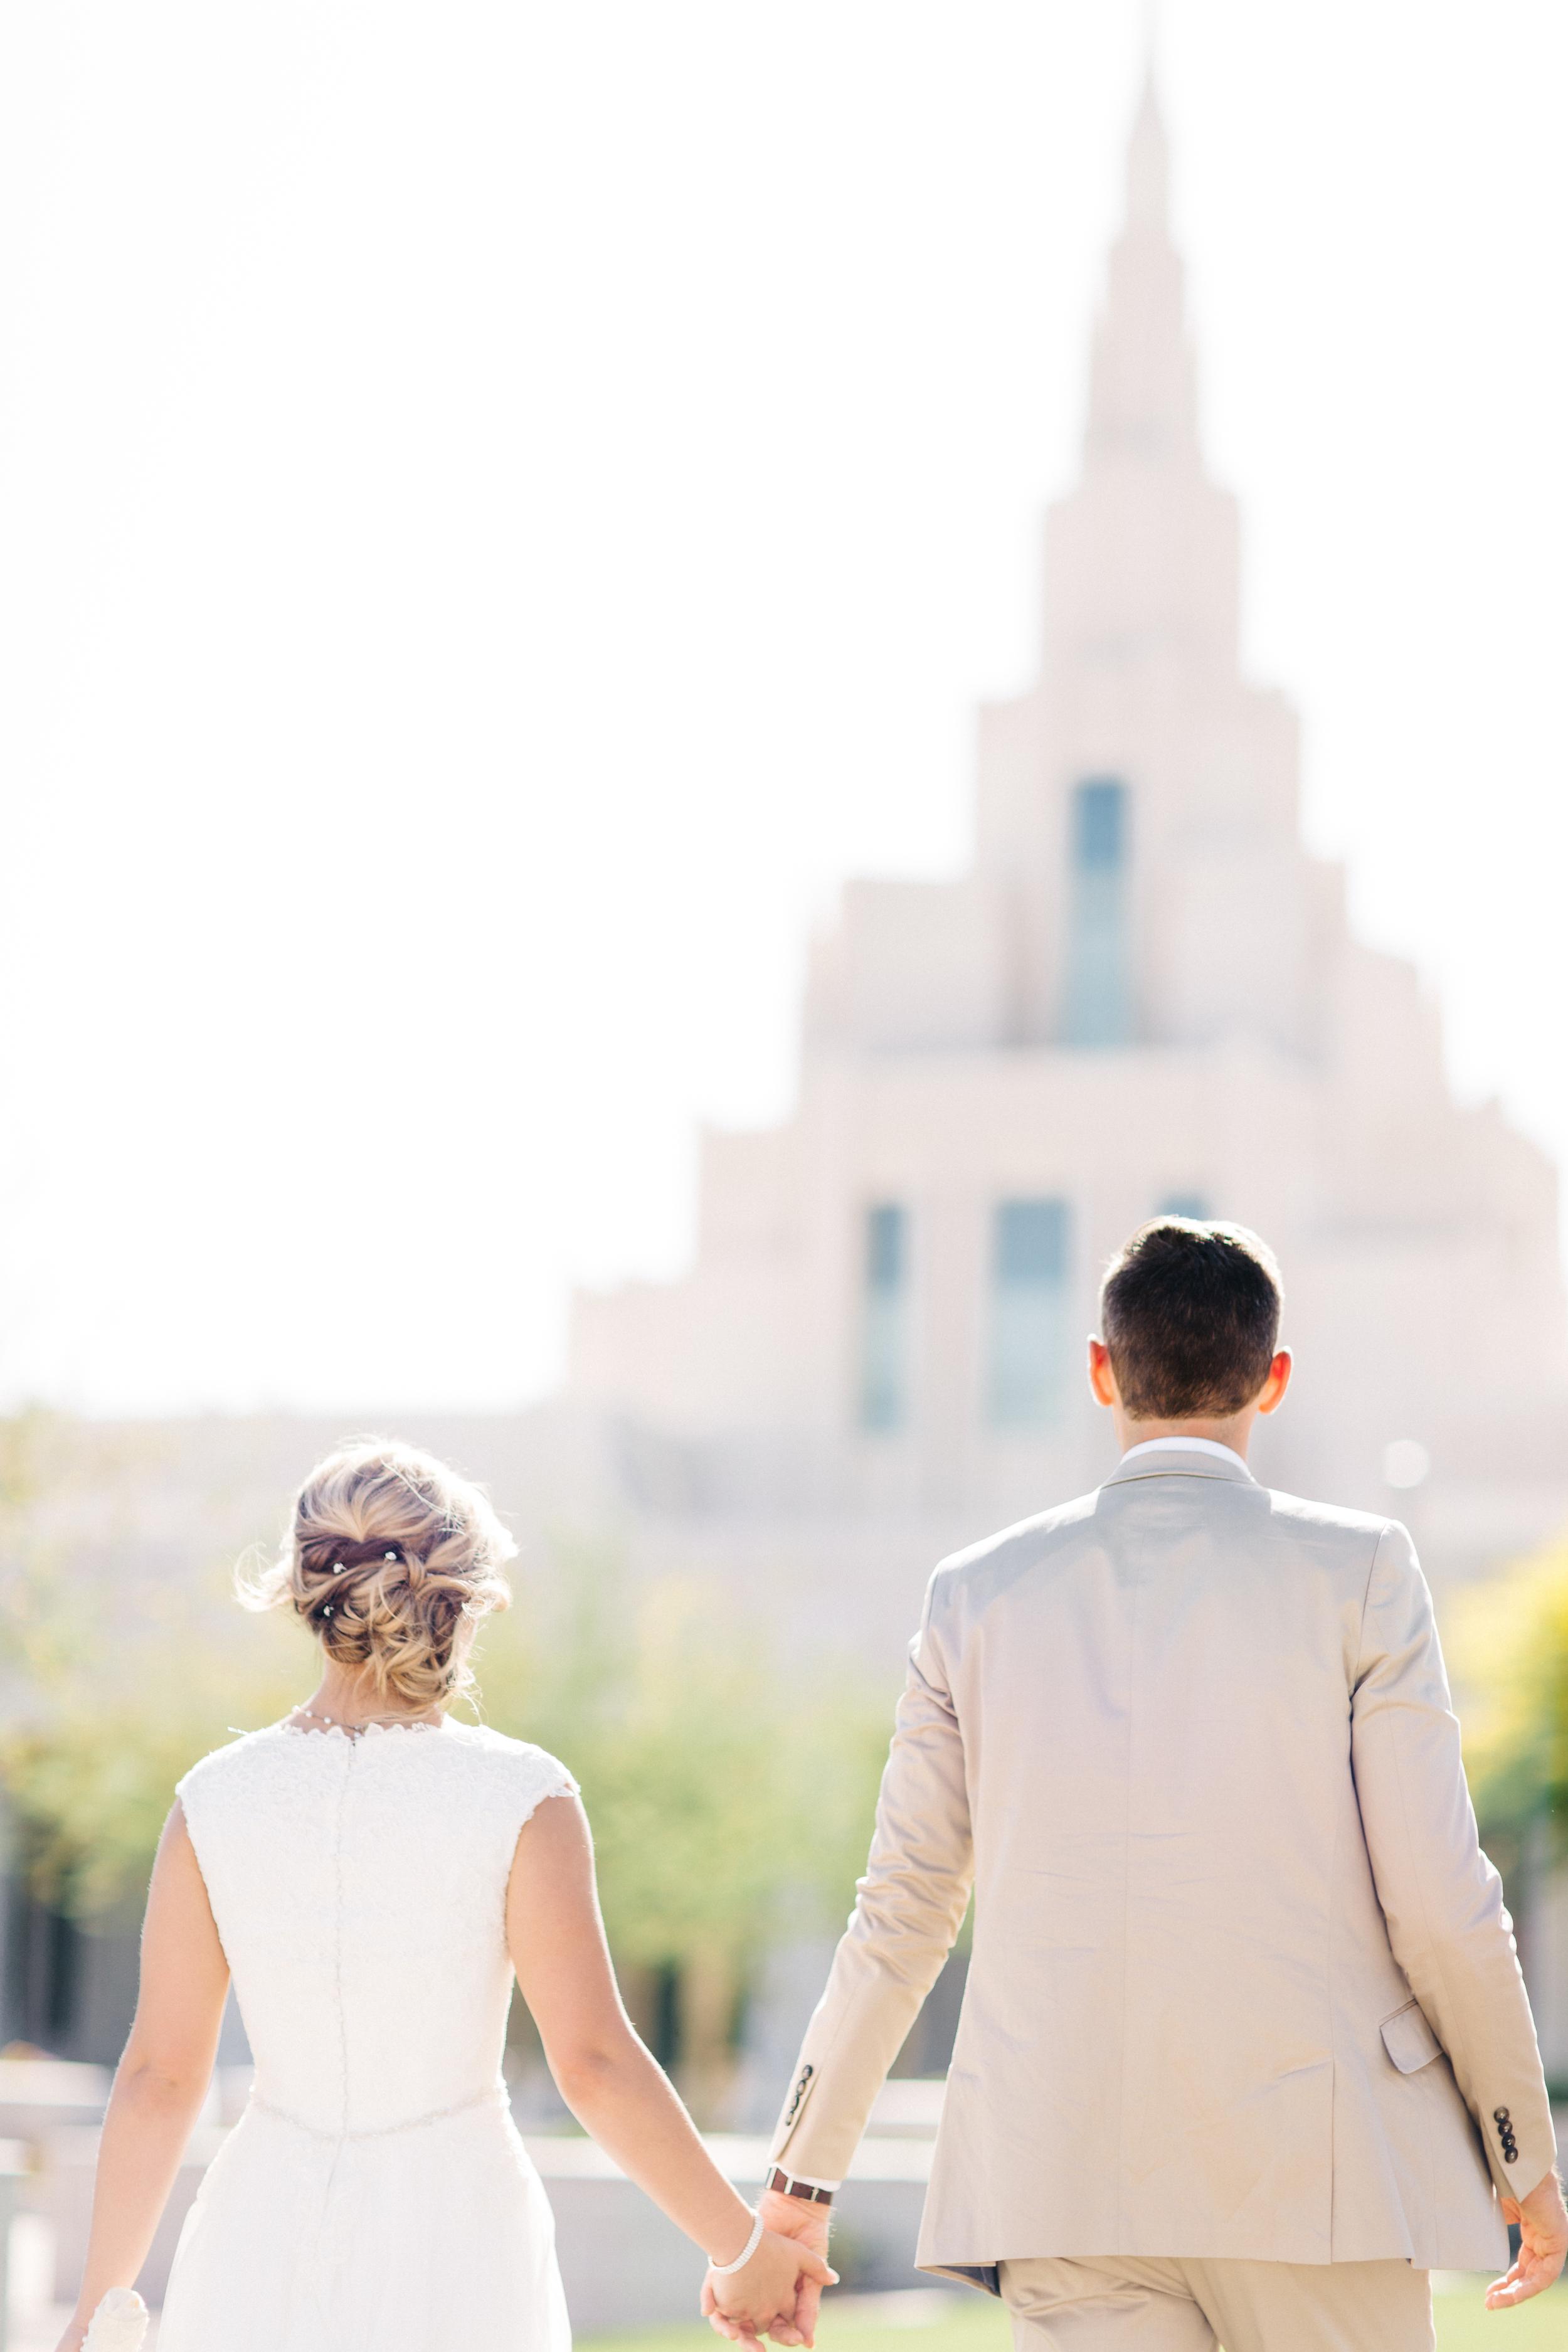 KennedyWyatt_WeddingDay-125.jpg